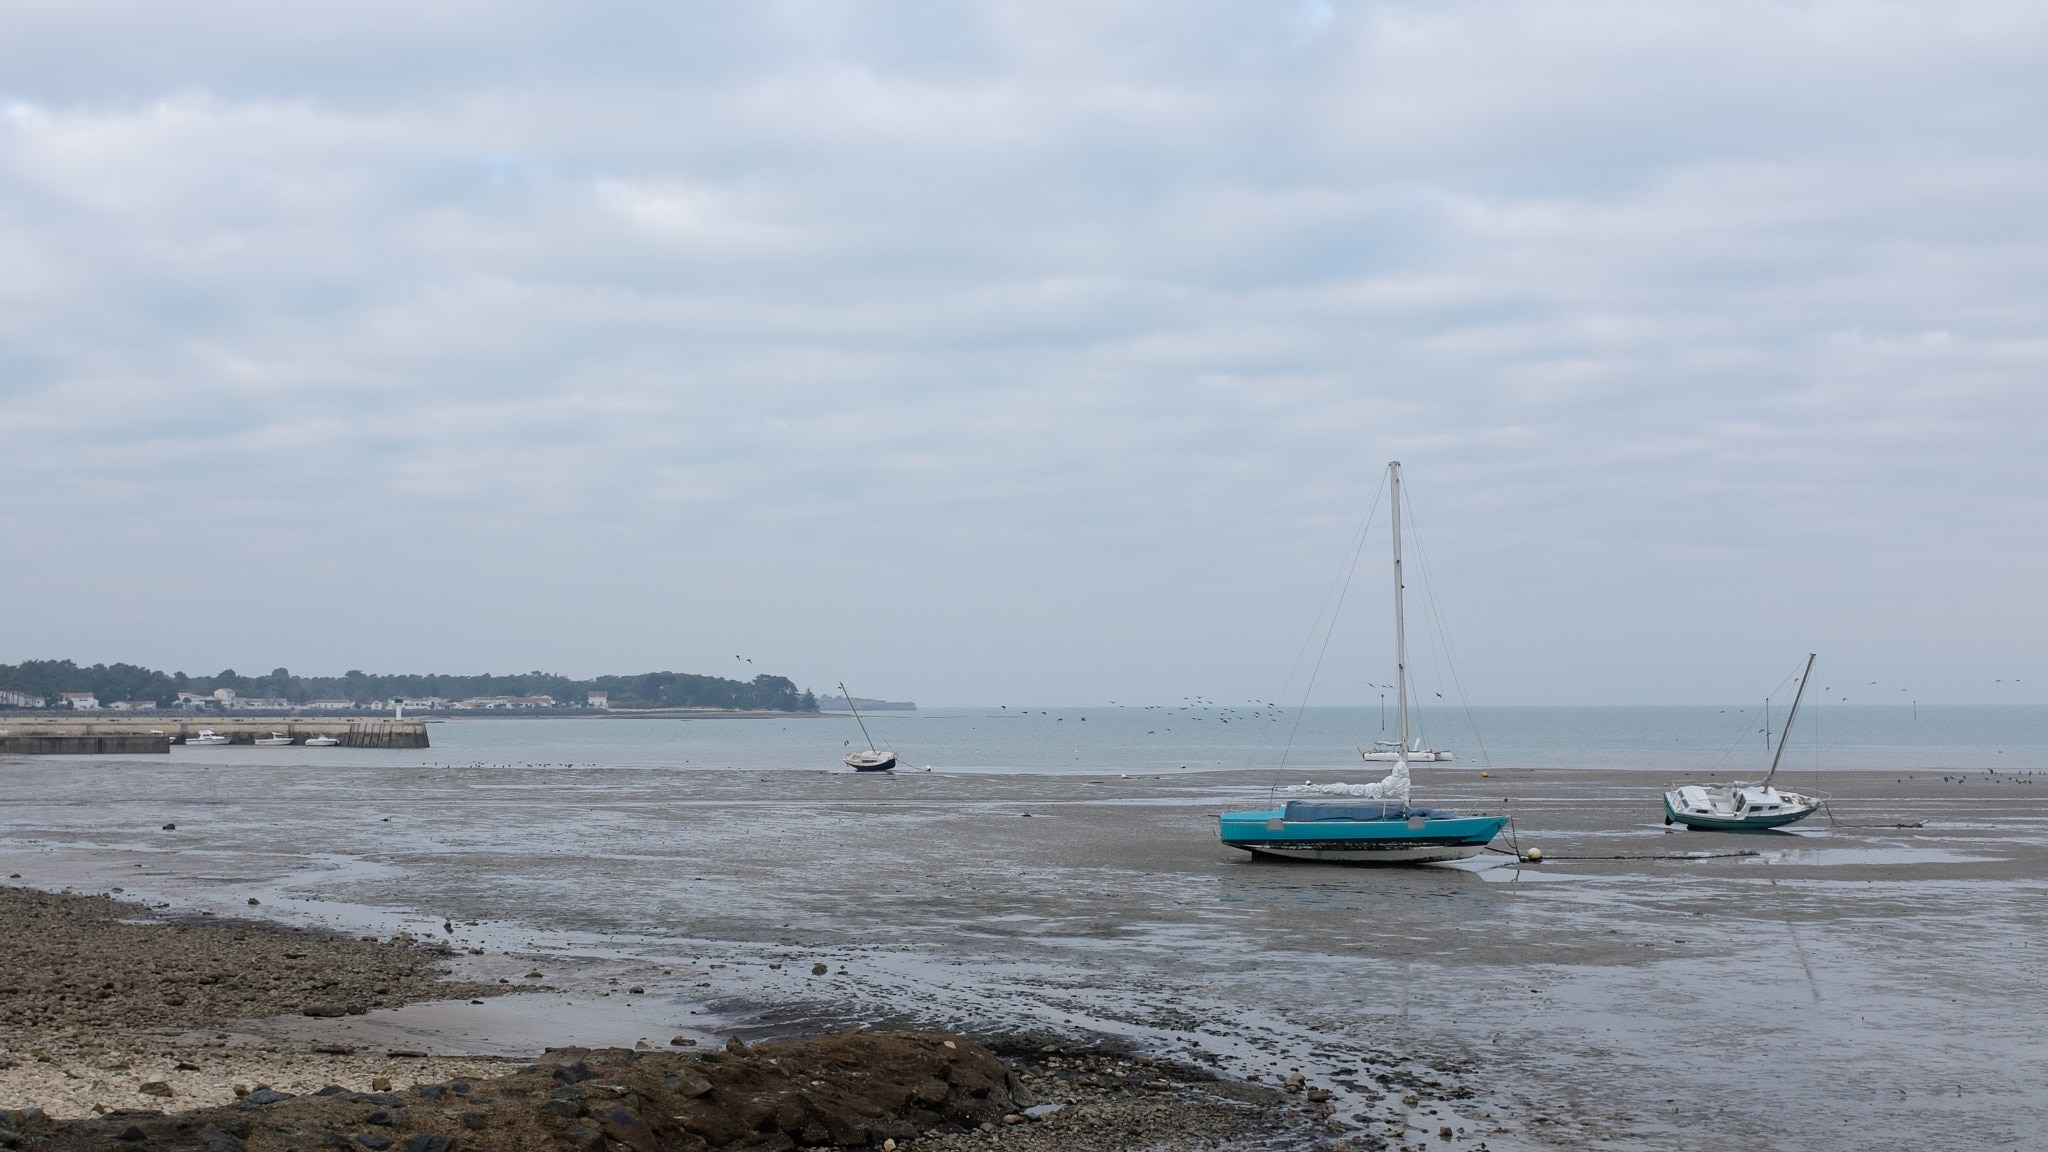 Rivedoux-Plage, Charente-Maritime, France